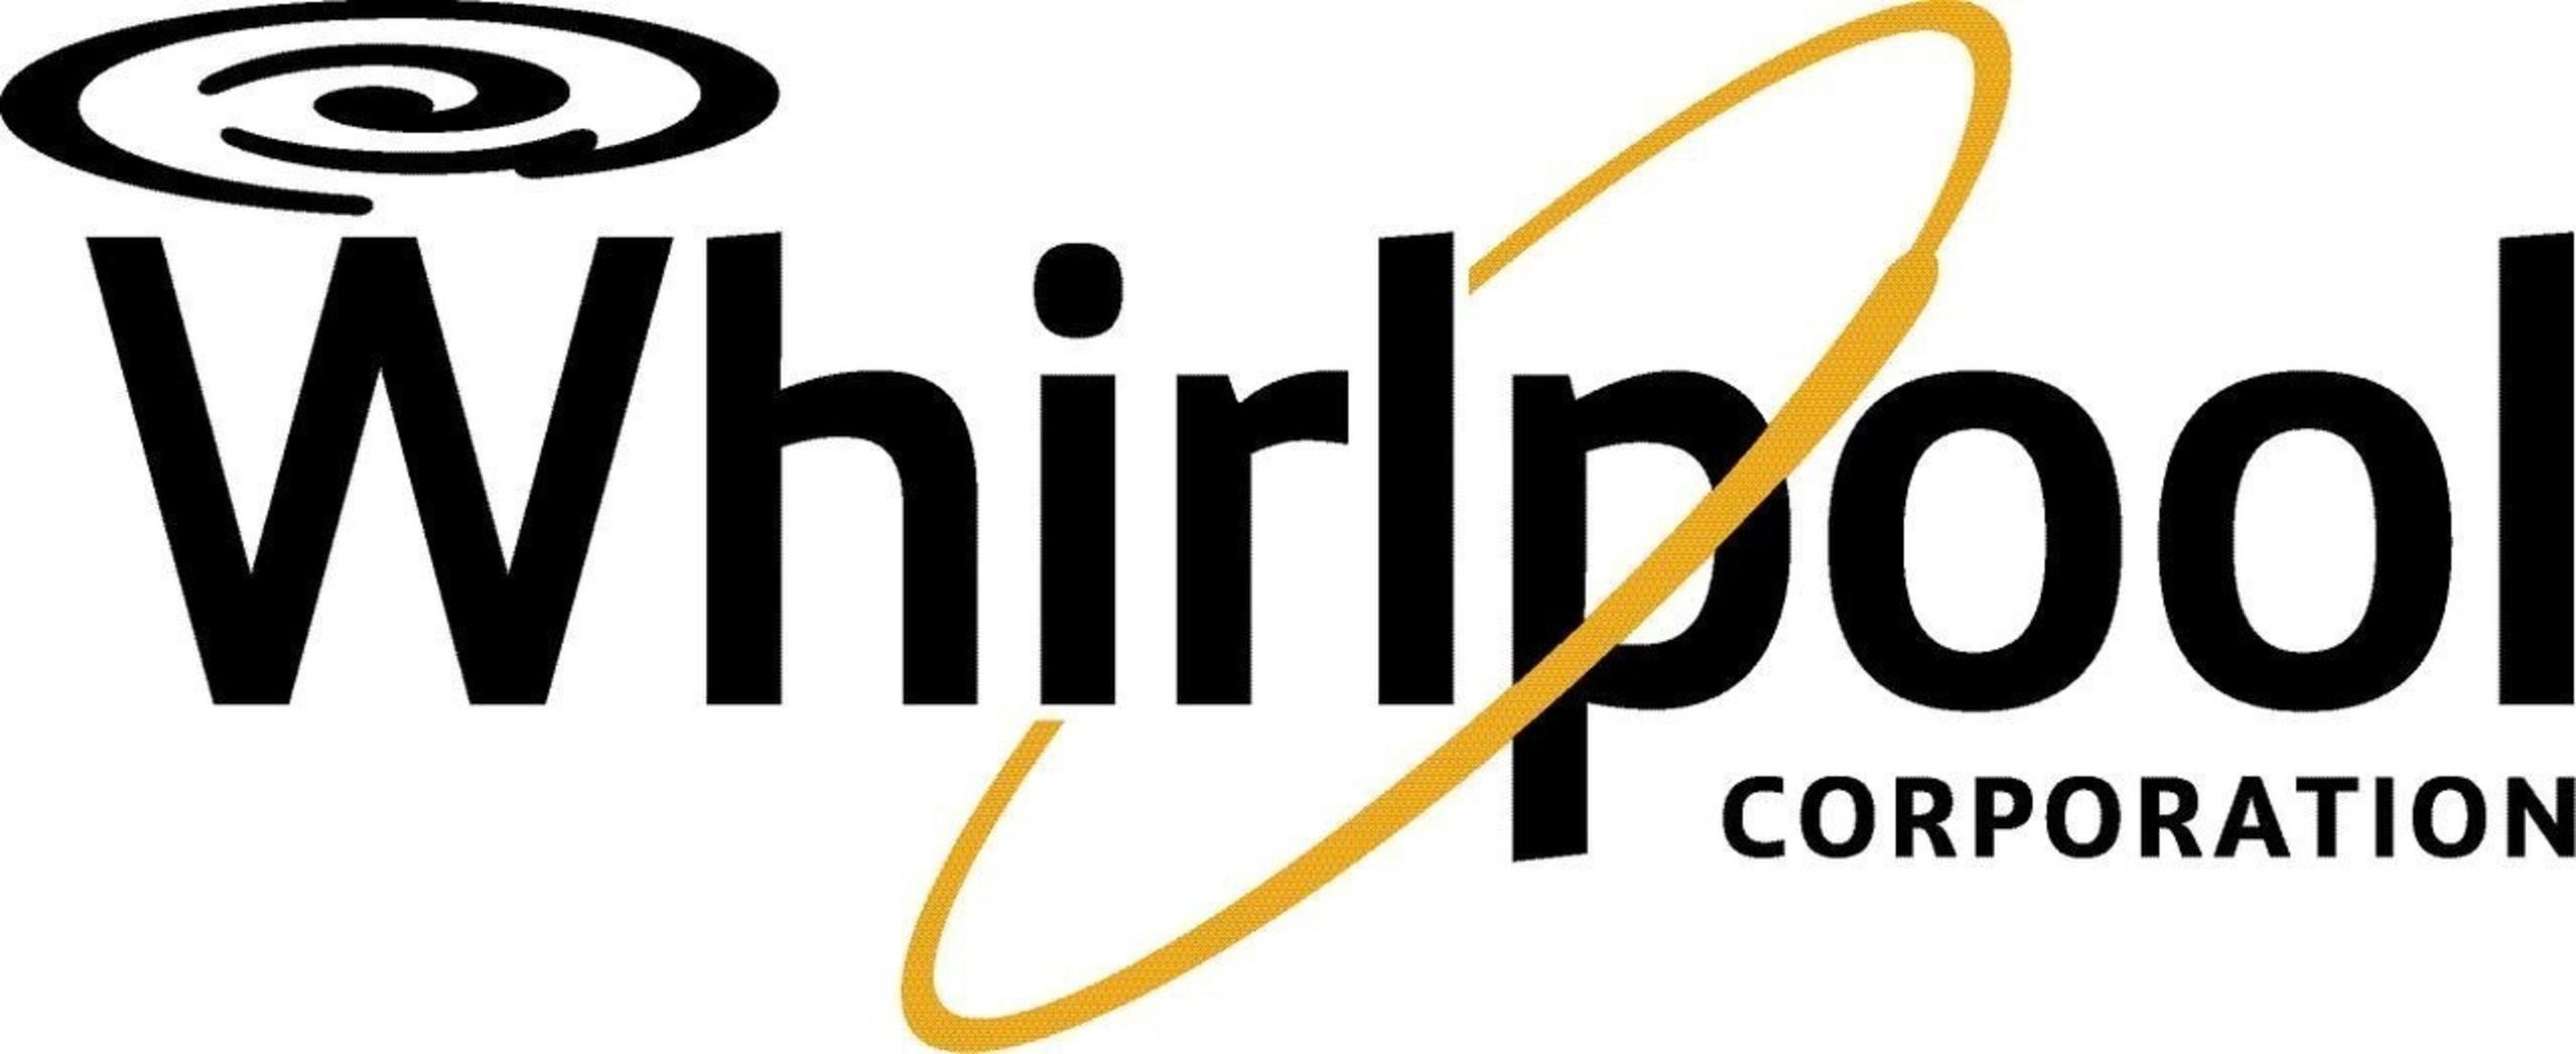 Whirlpool Corporation (PRNewsFoto/Whirlpool Corporation)